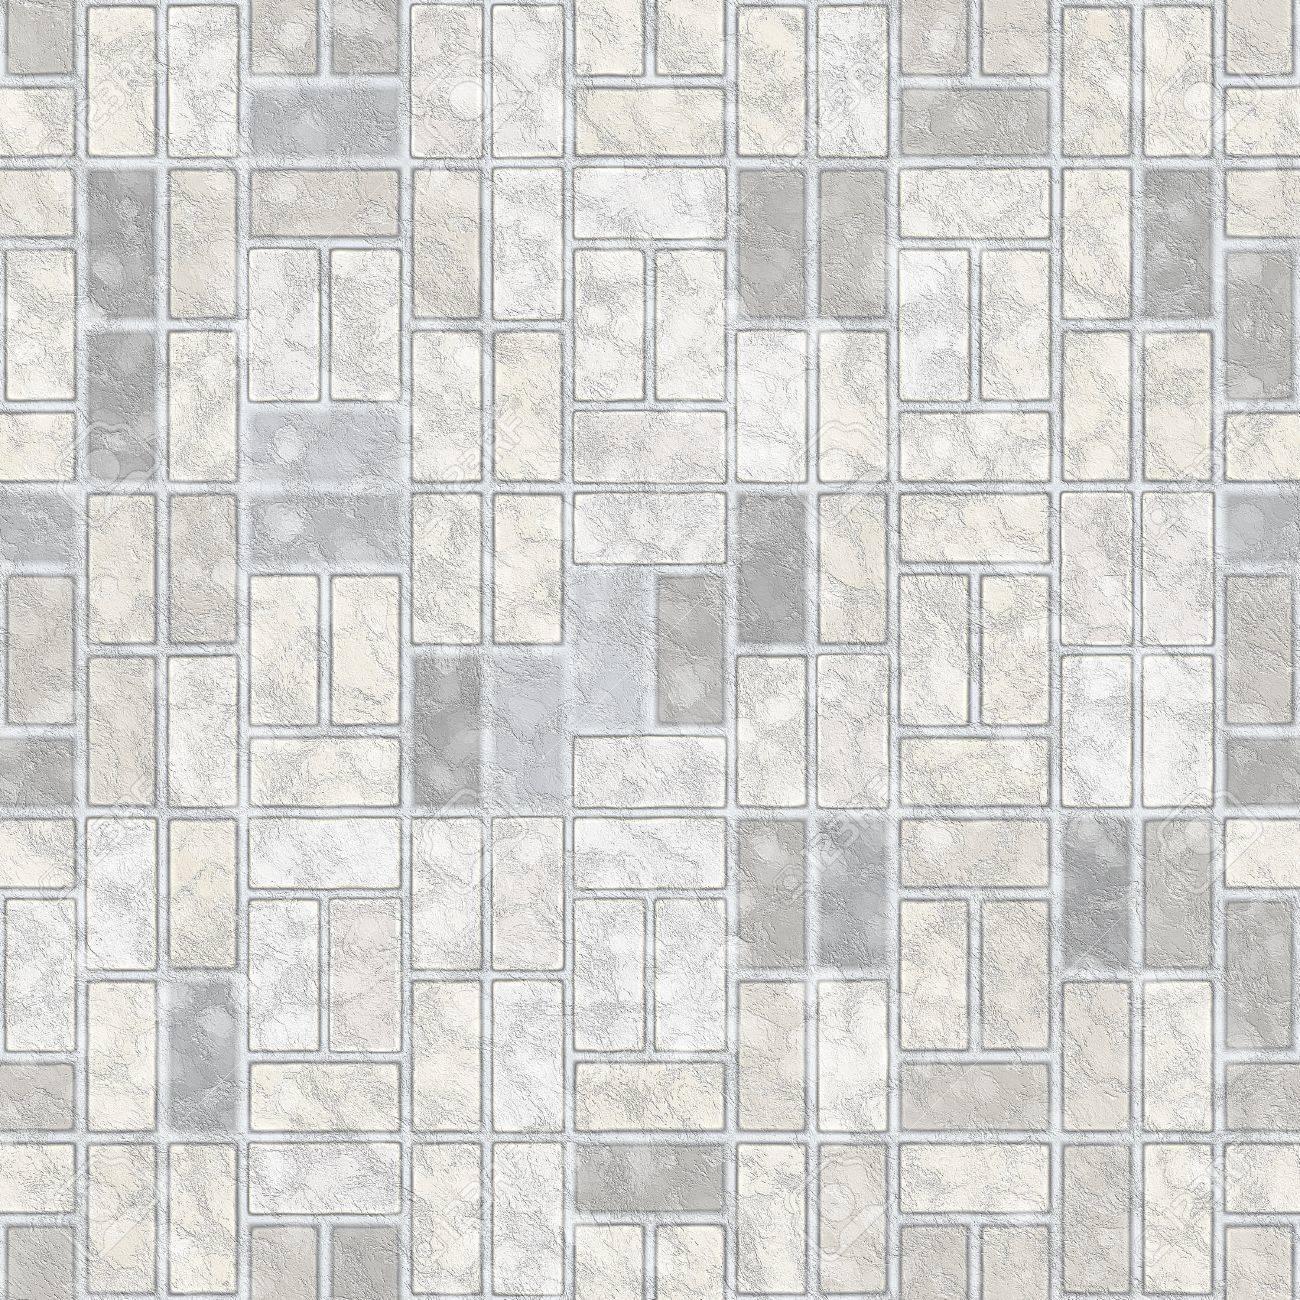 floor tile seamless texture